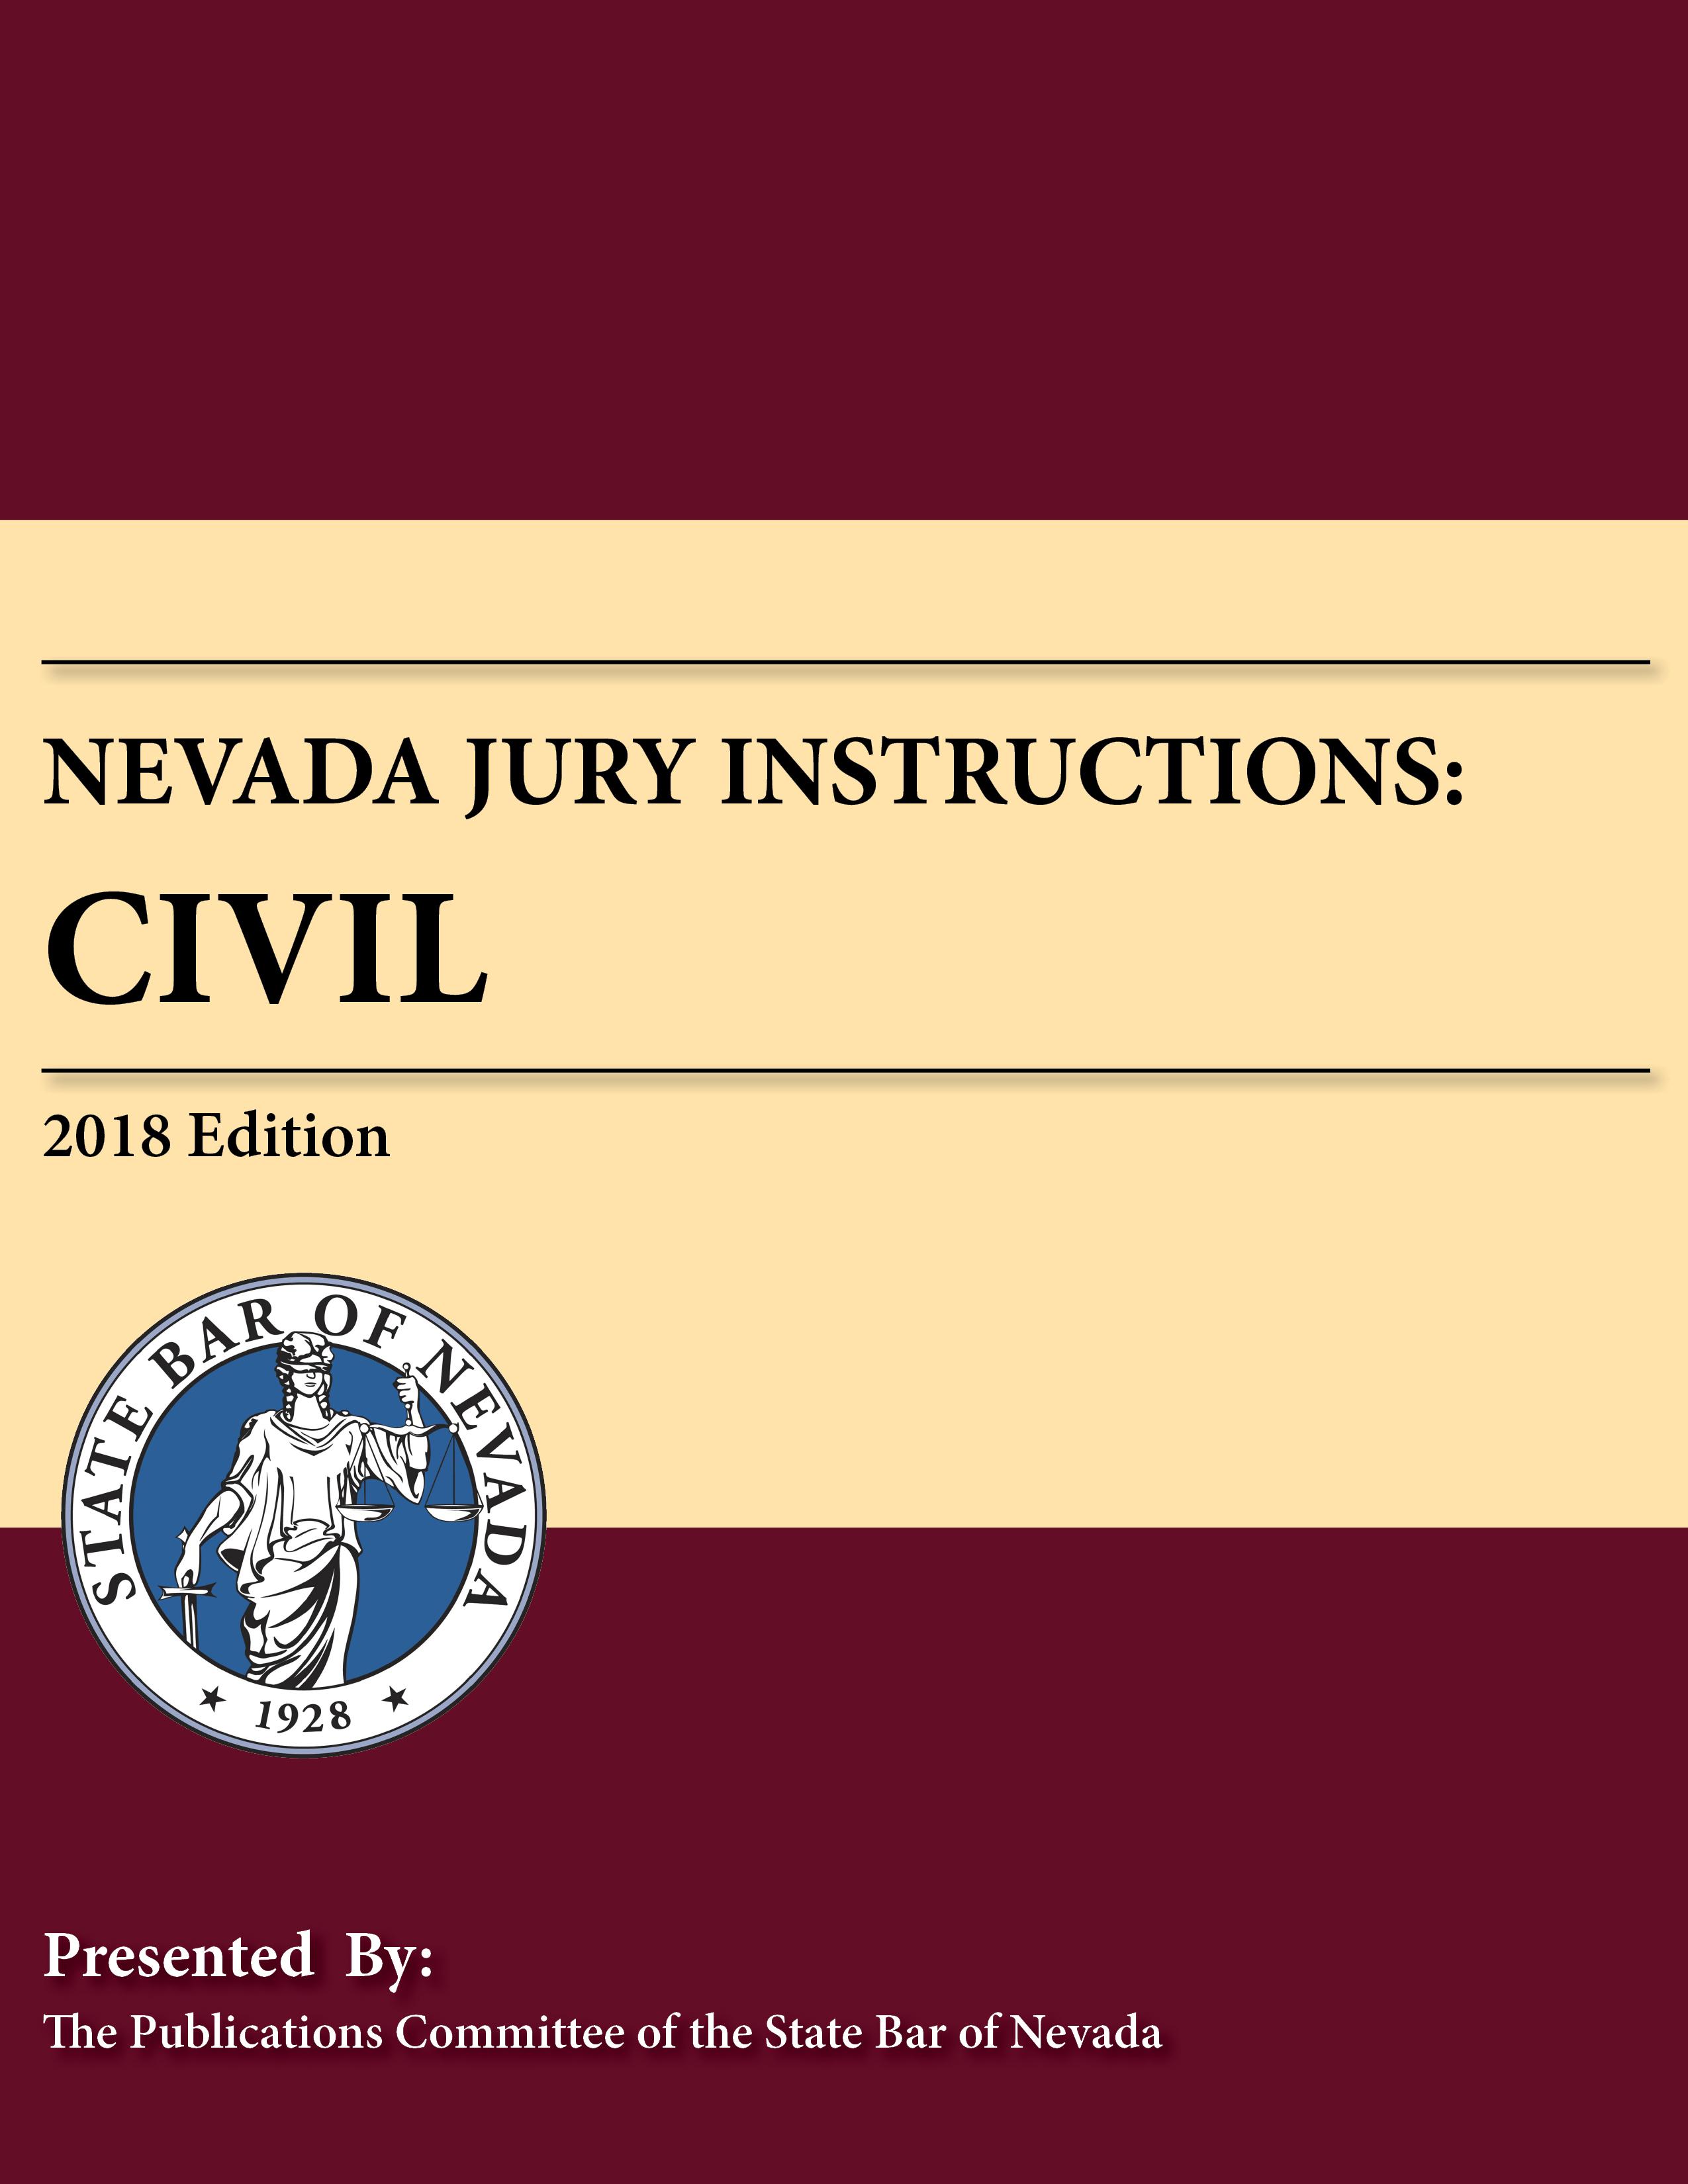 Nevada Jury Instructions: Civil, 2018 Edition